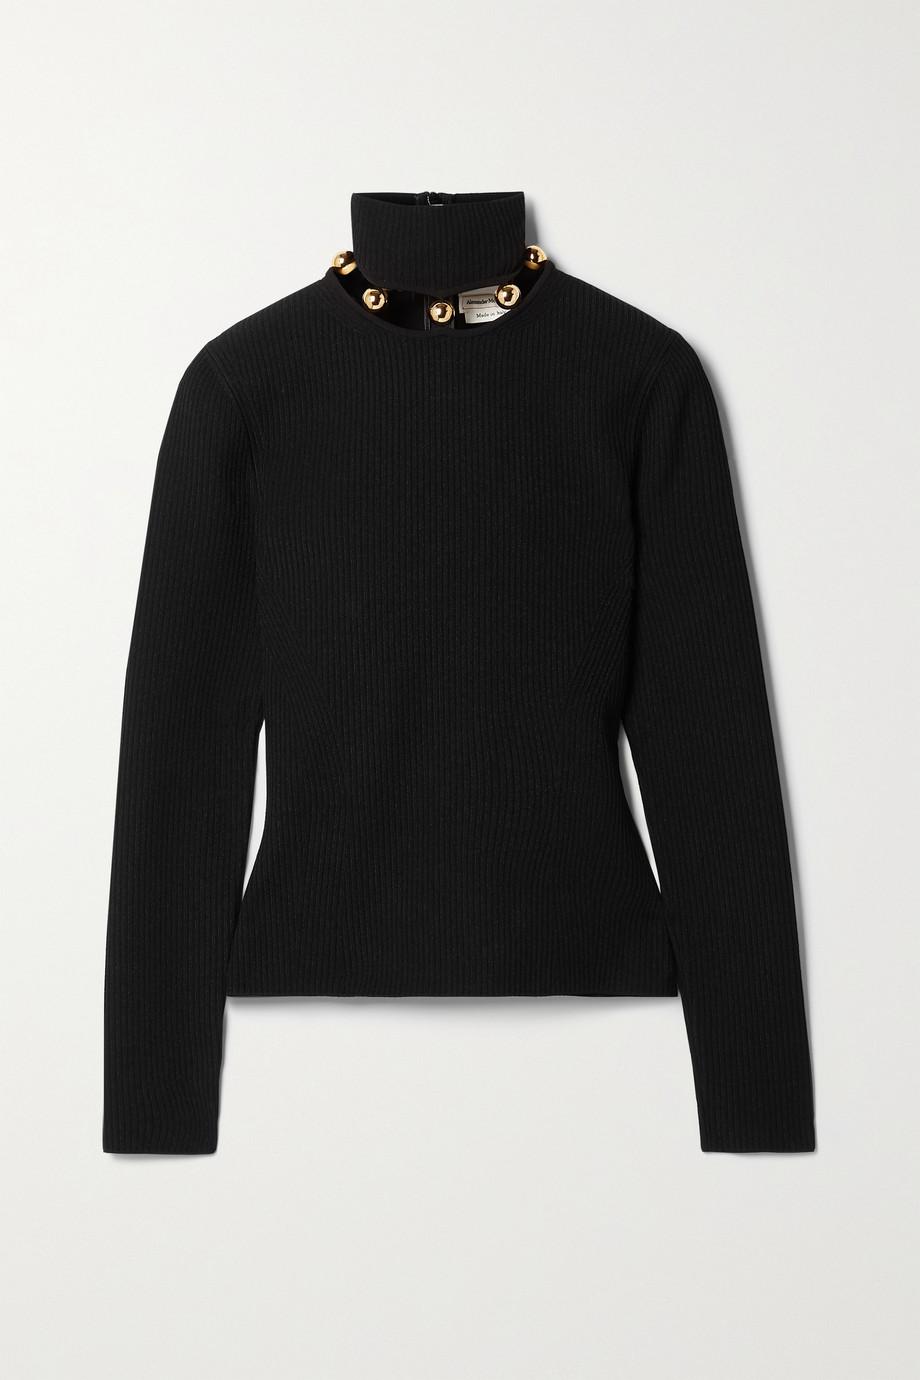 Alexander McQueen Embellished ribbed-knit turtleneck sweater